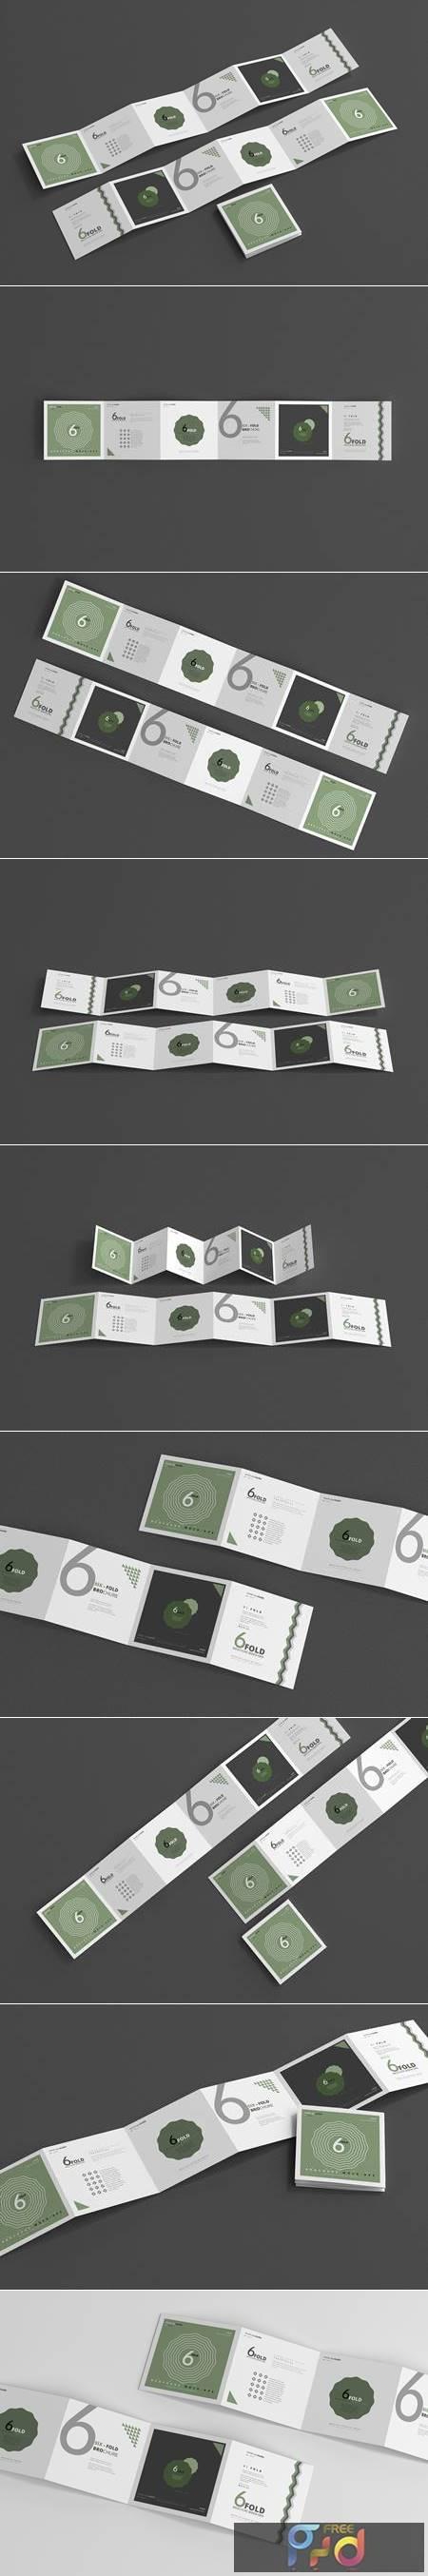 Six Fold Square Brochure Mockups 4718114 1